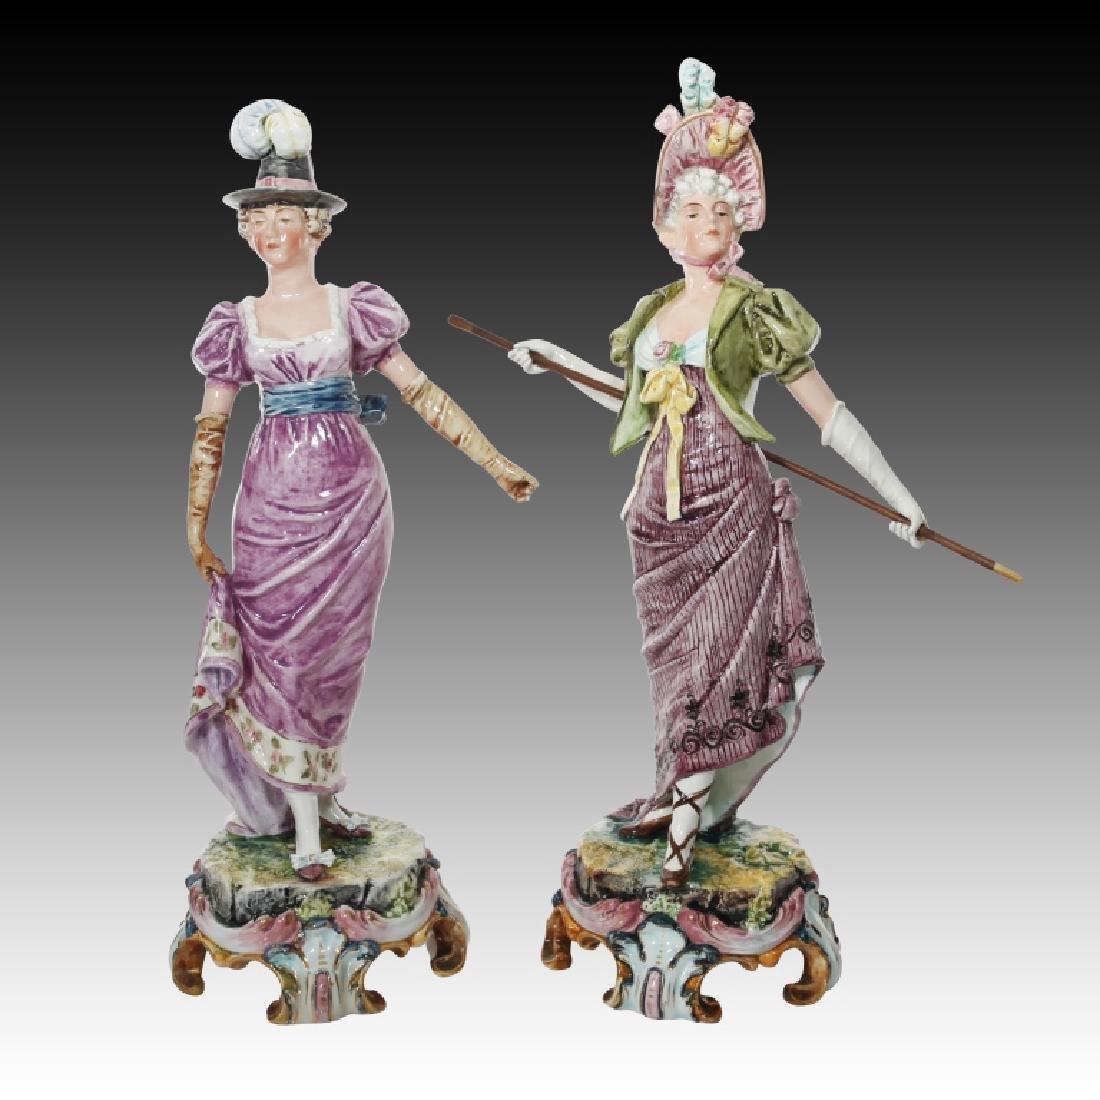 Majolica Figural Pair of Women in Regency Dress